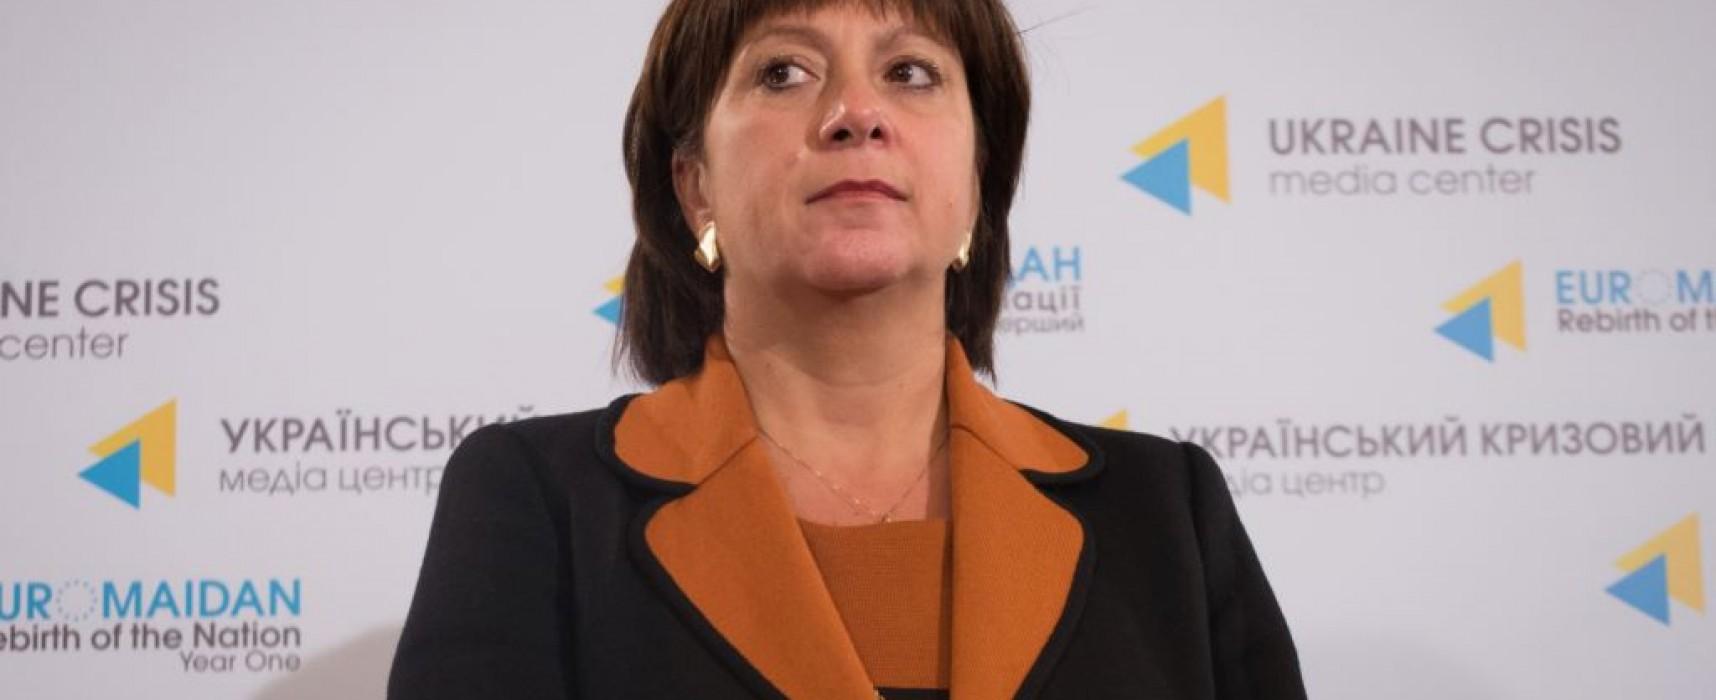 Fake: The Minister of Finance of Ukraine Natalie Jaresko is a Sister of Yushchenko's Wife